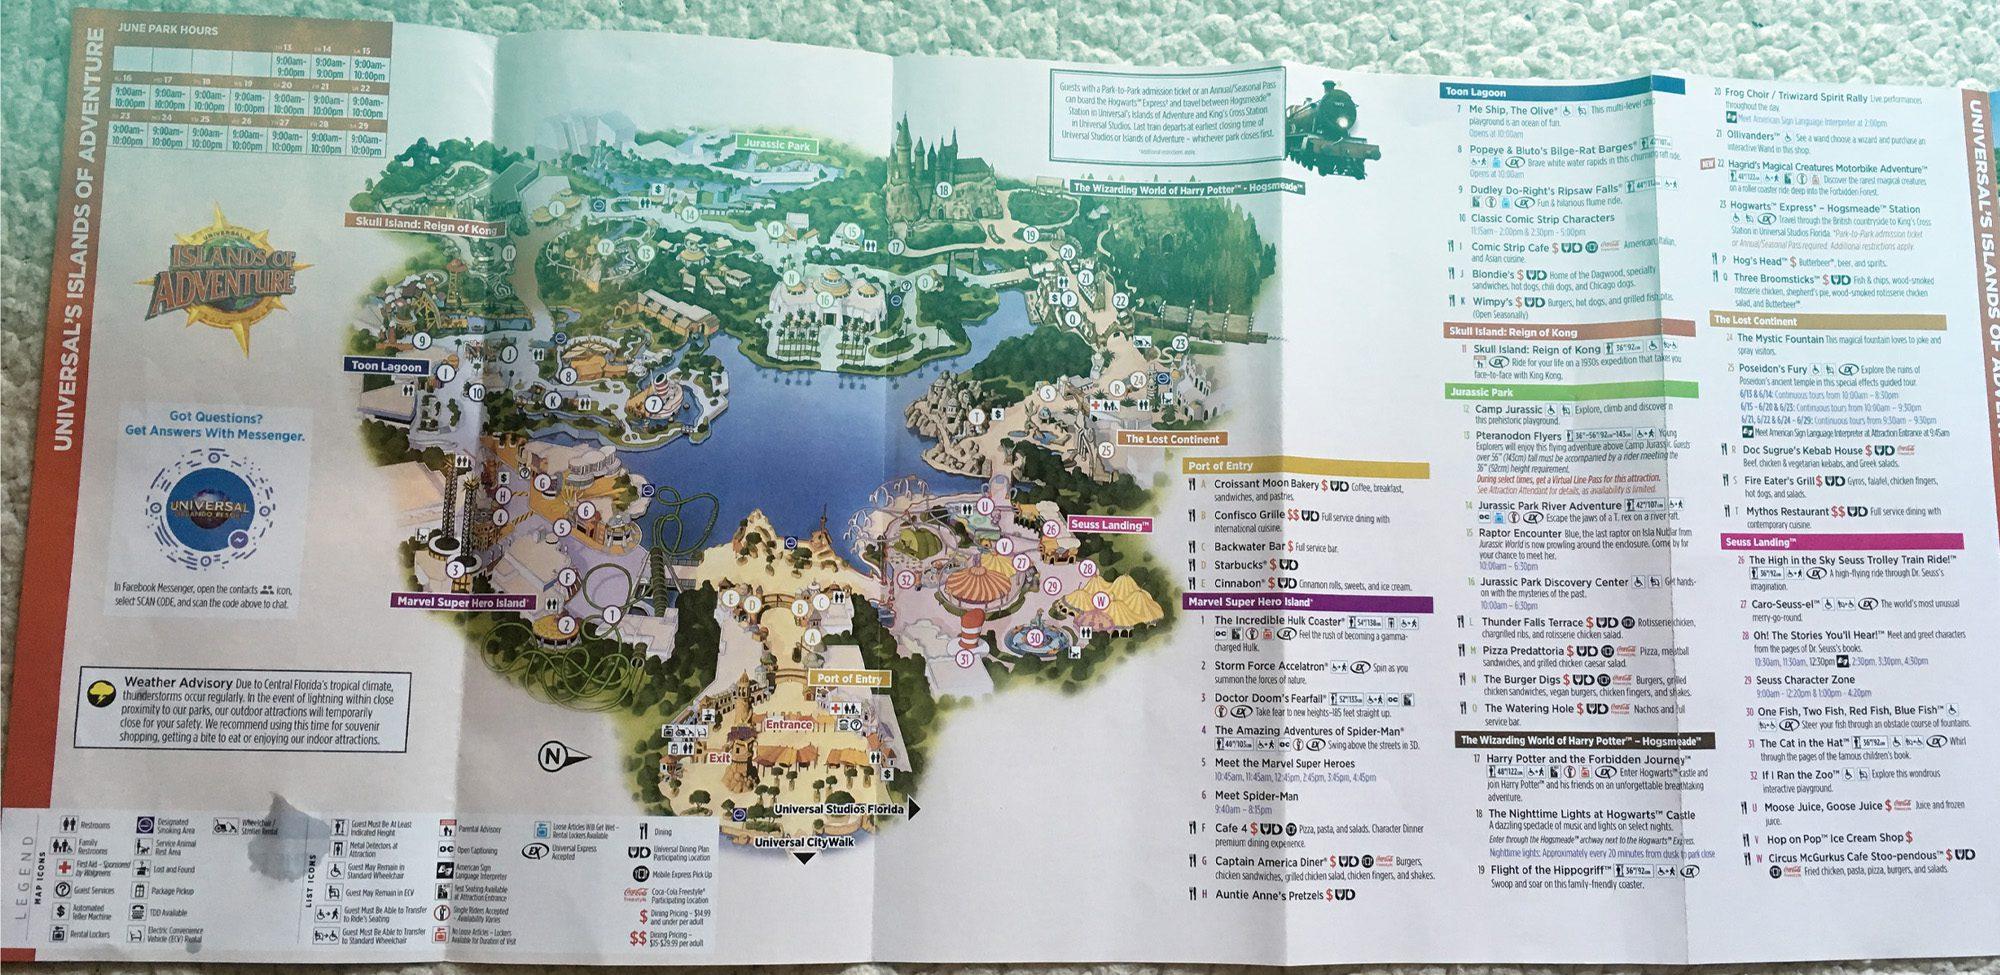 2019 islands of adventure map orlando